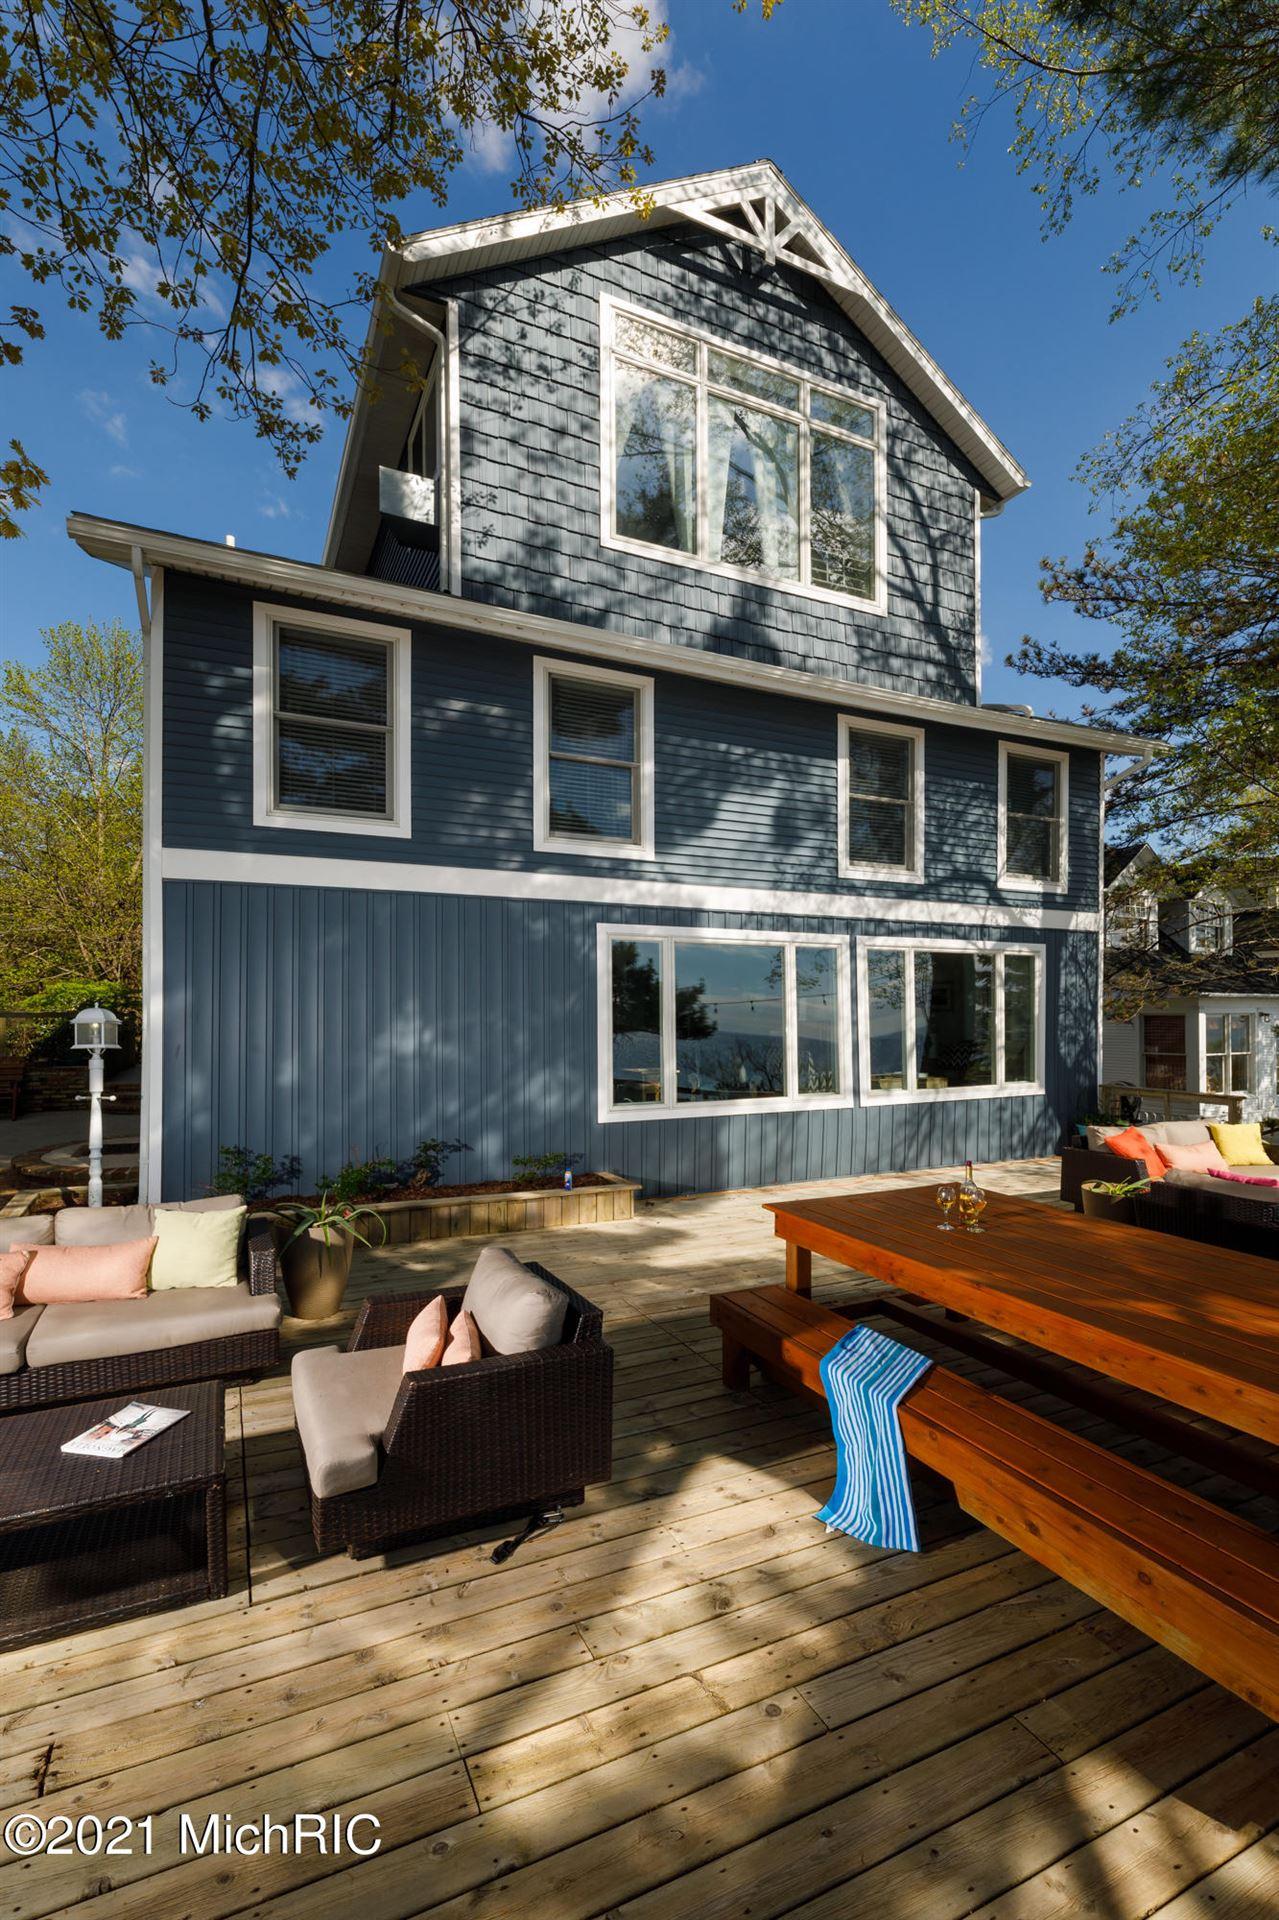 Photo of 1100 S Harbor Drive, Grand Haven, MI 49417 (MLS # 21103838)